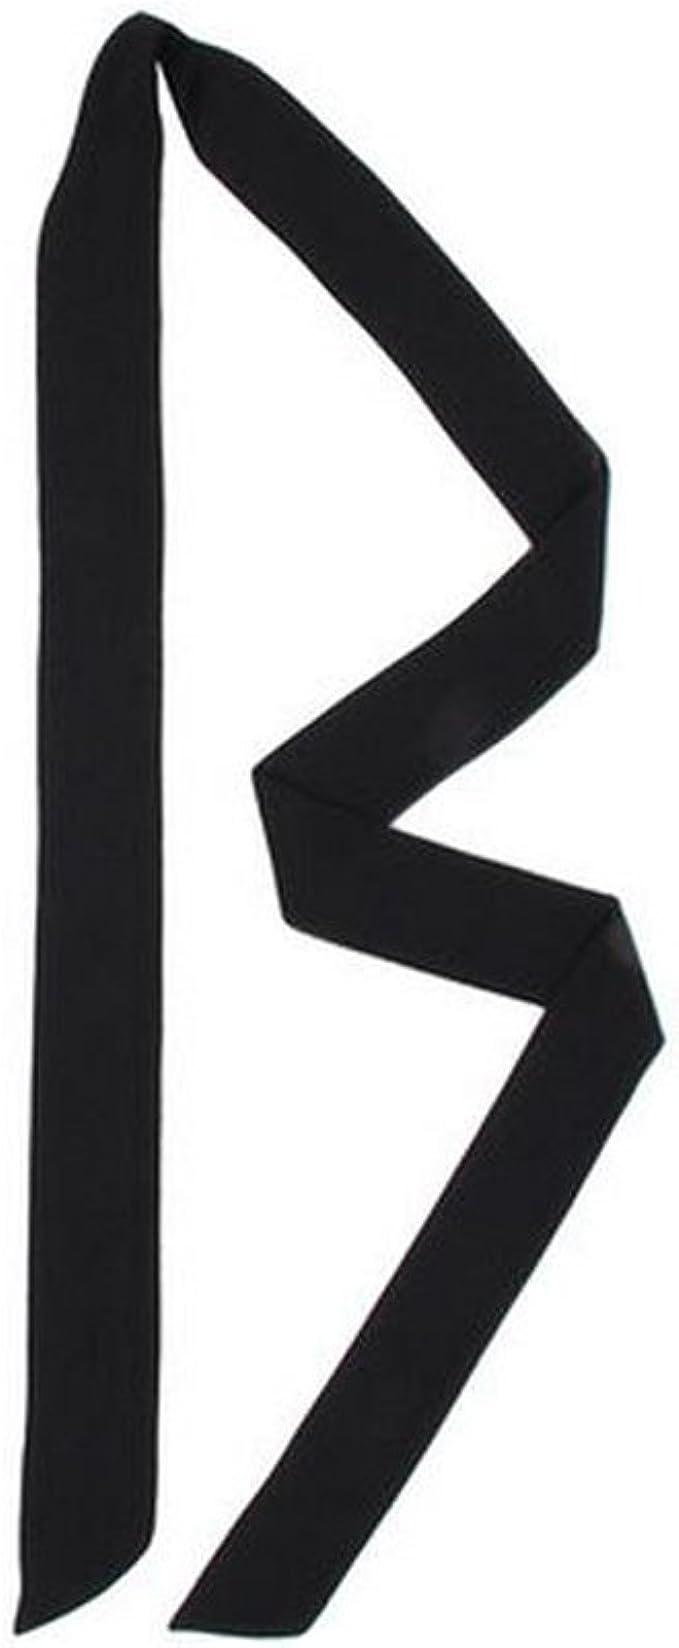 A History of Belts 1920-1960 Fashionable Silk Scarves Summer All-Match Belt Neckerchief(Black) $7.99 AT vintagedancer.com